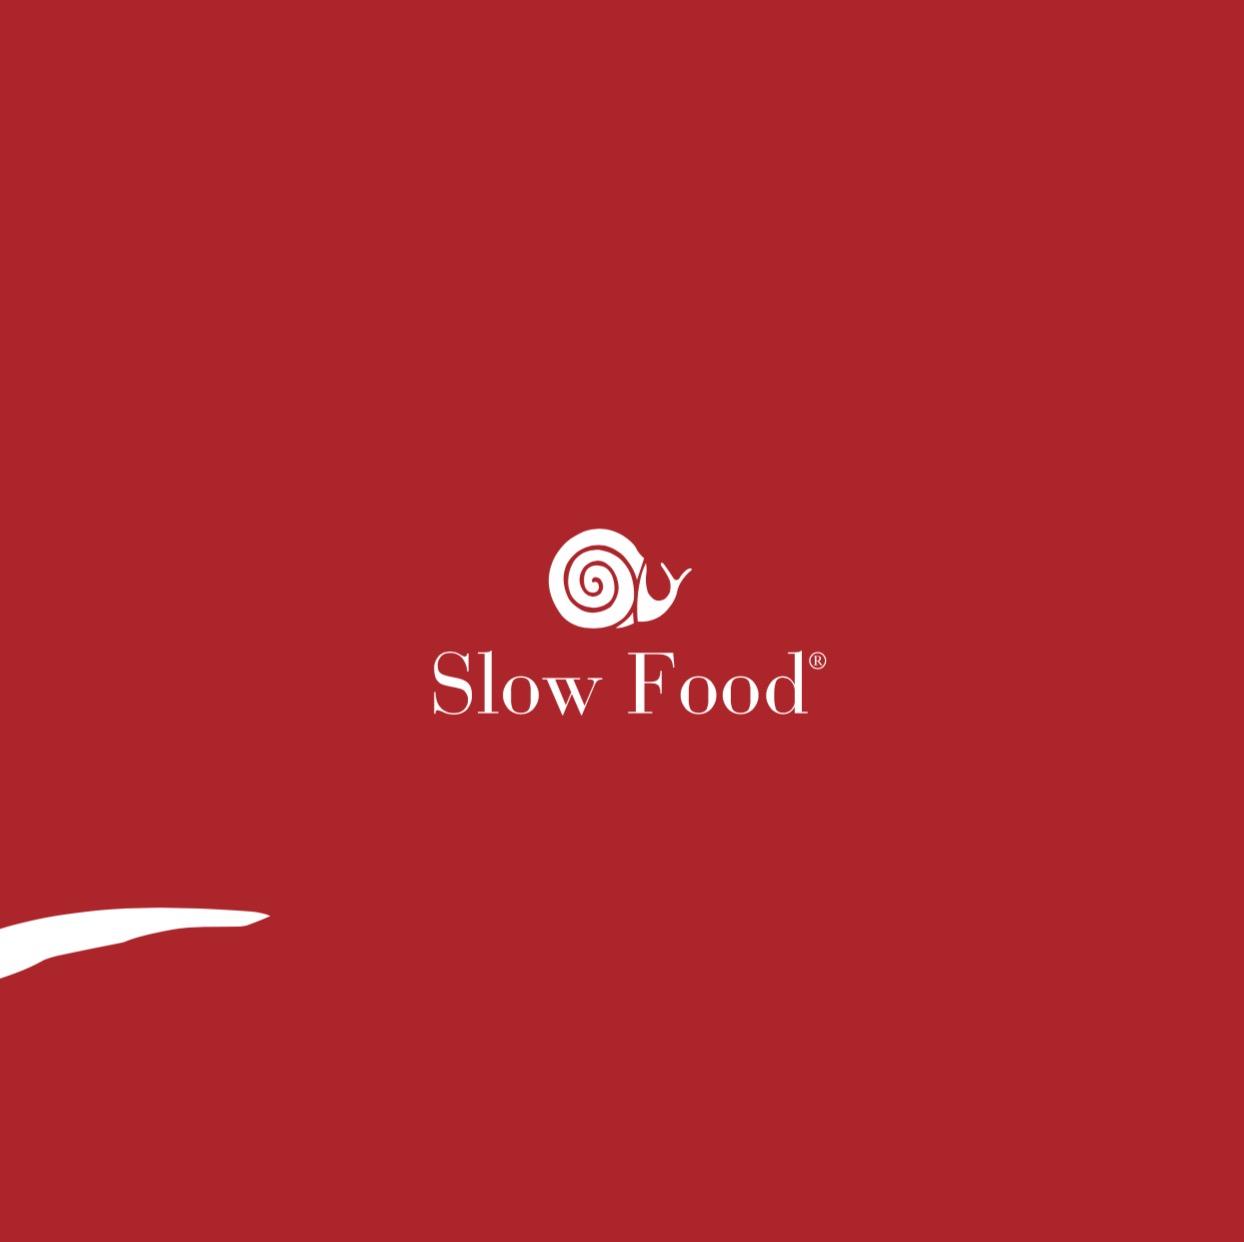 Slow Food (3)